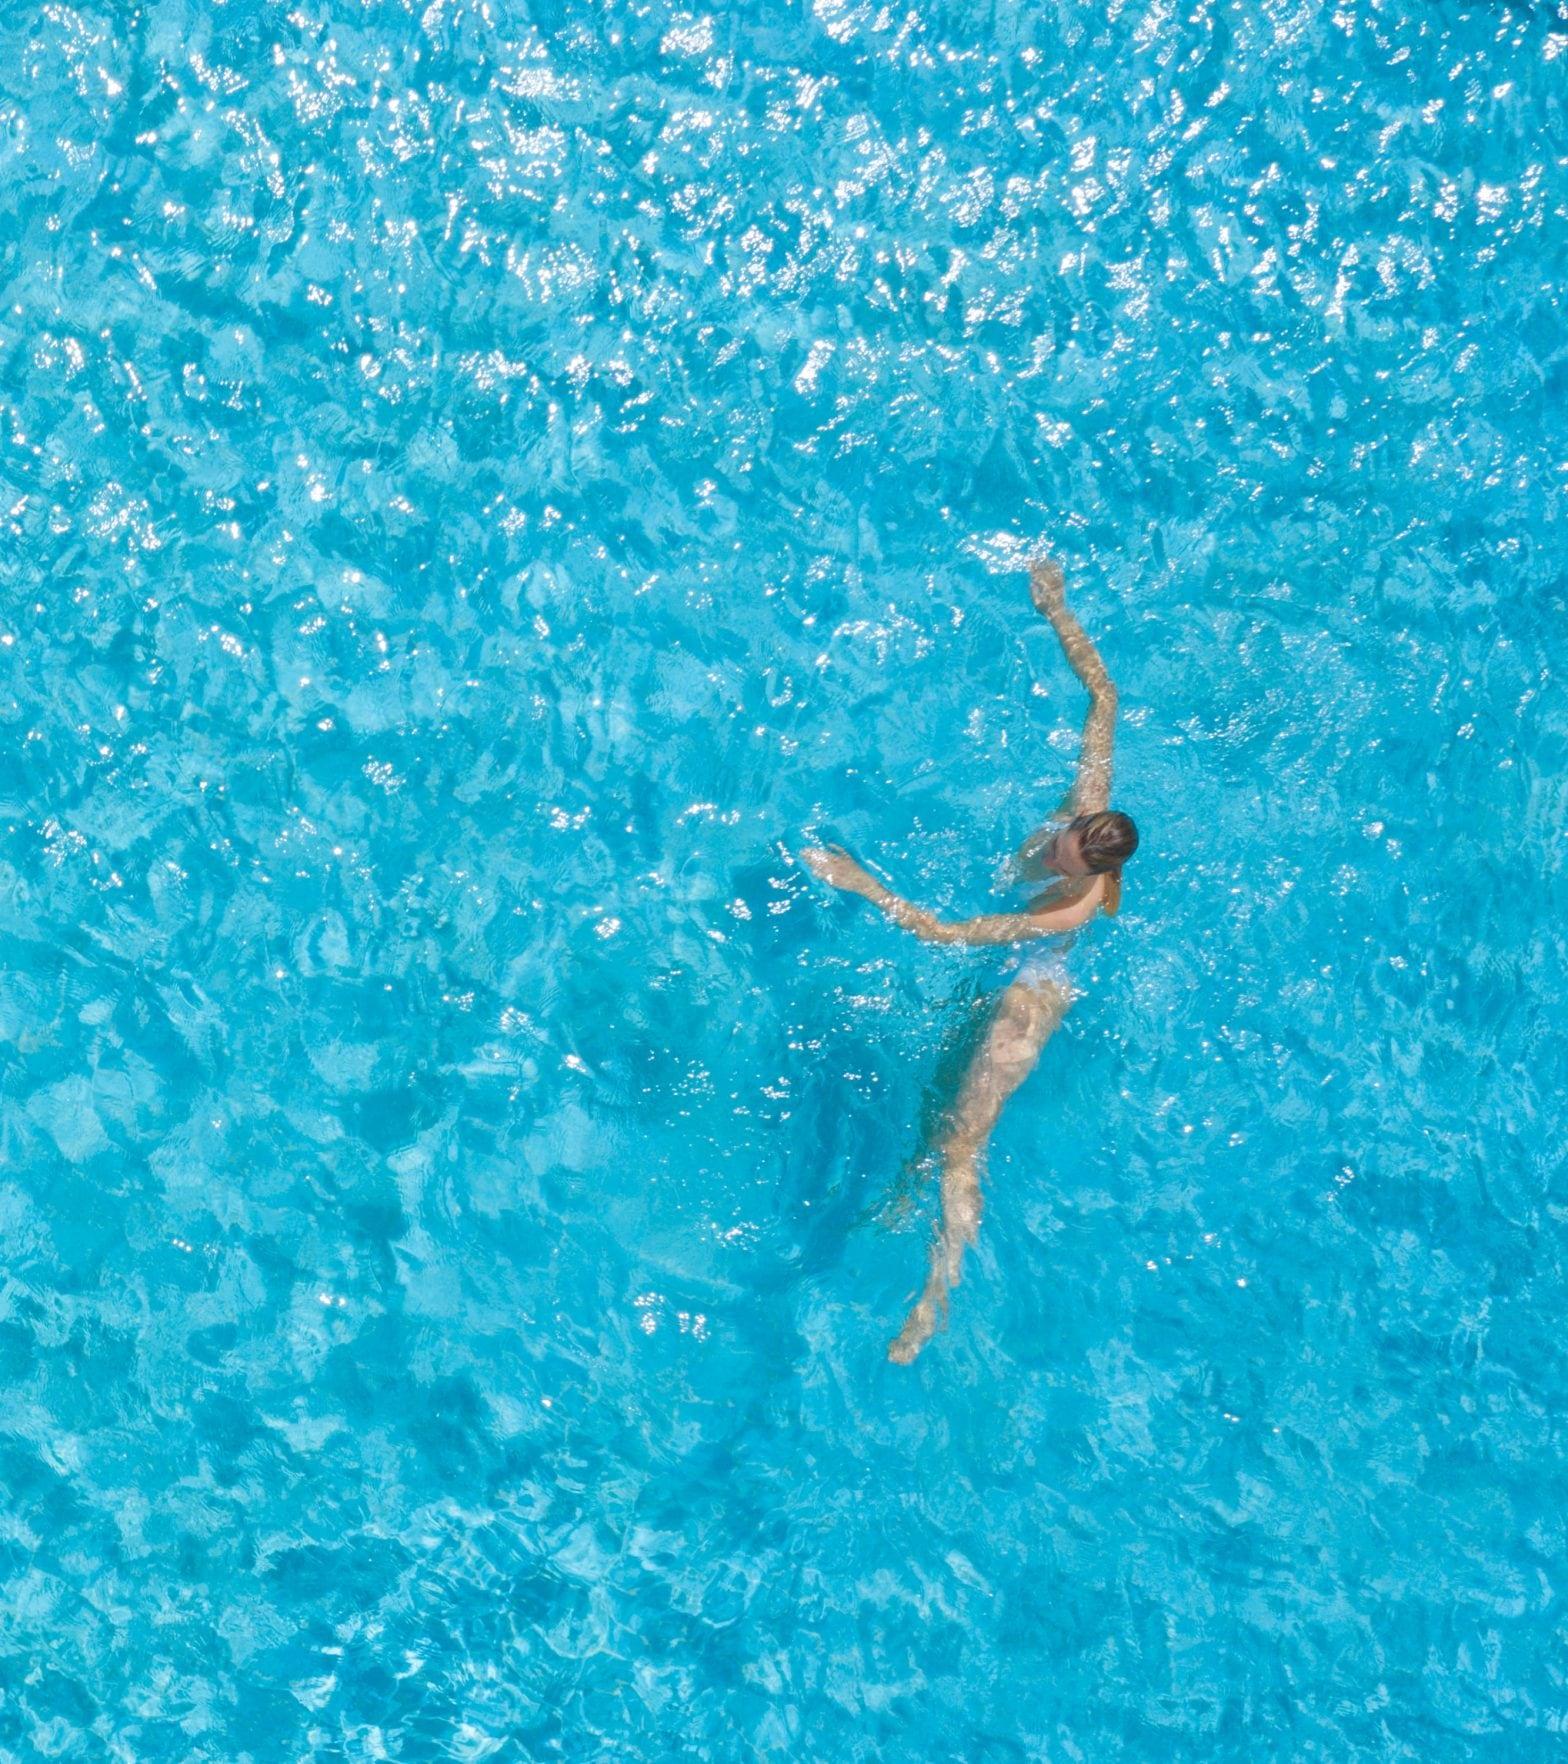 Pool - Schwimmerin Drohne